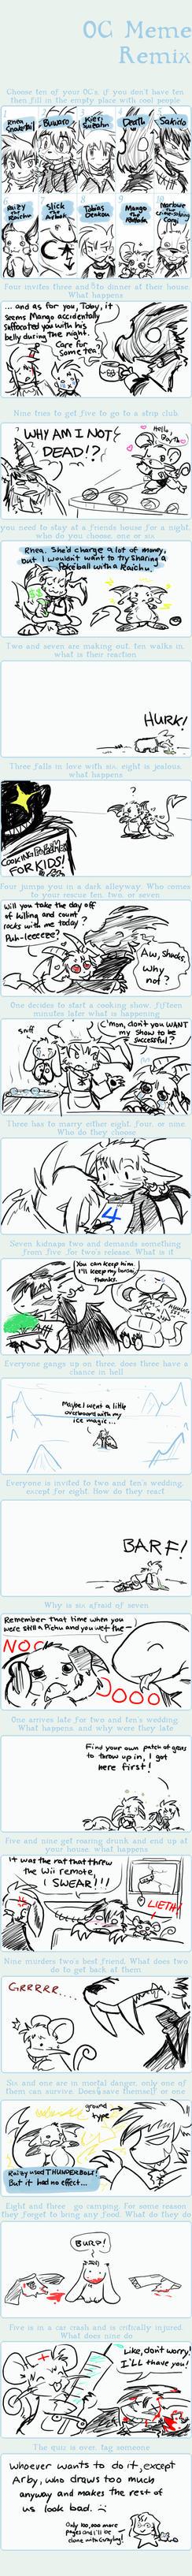 OC Art Meme by raizy